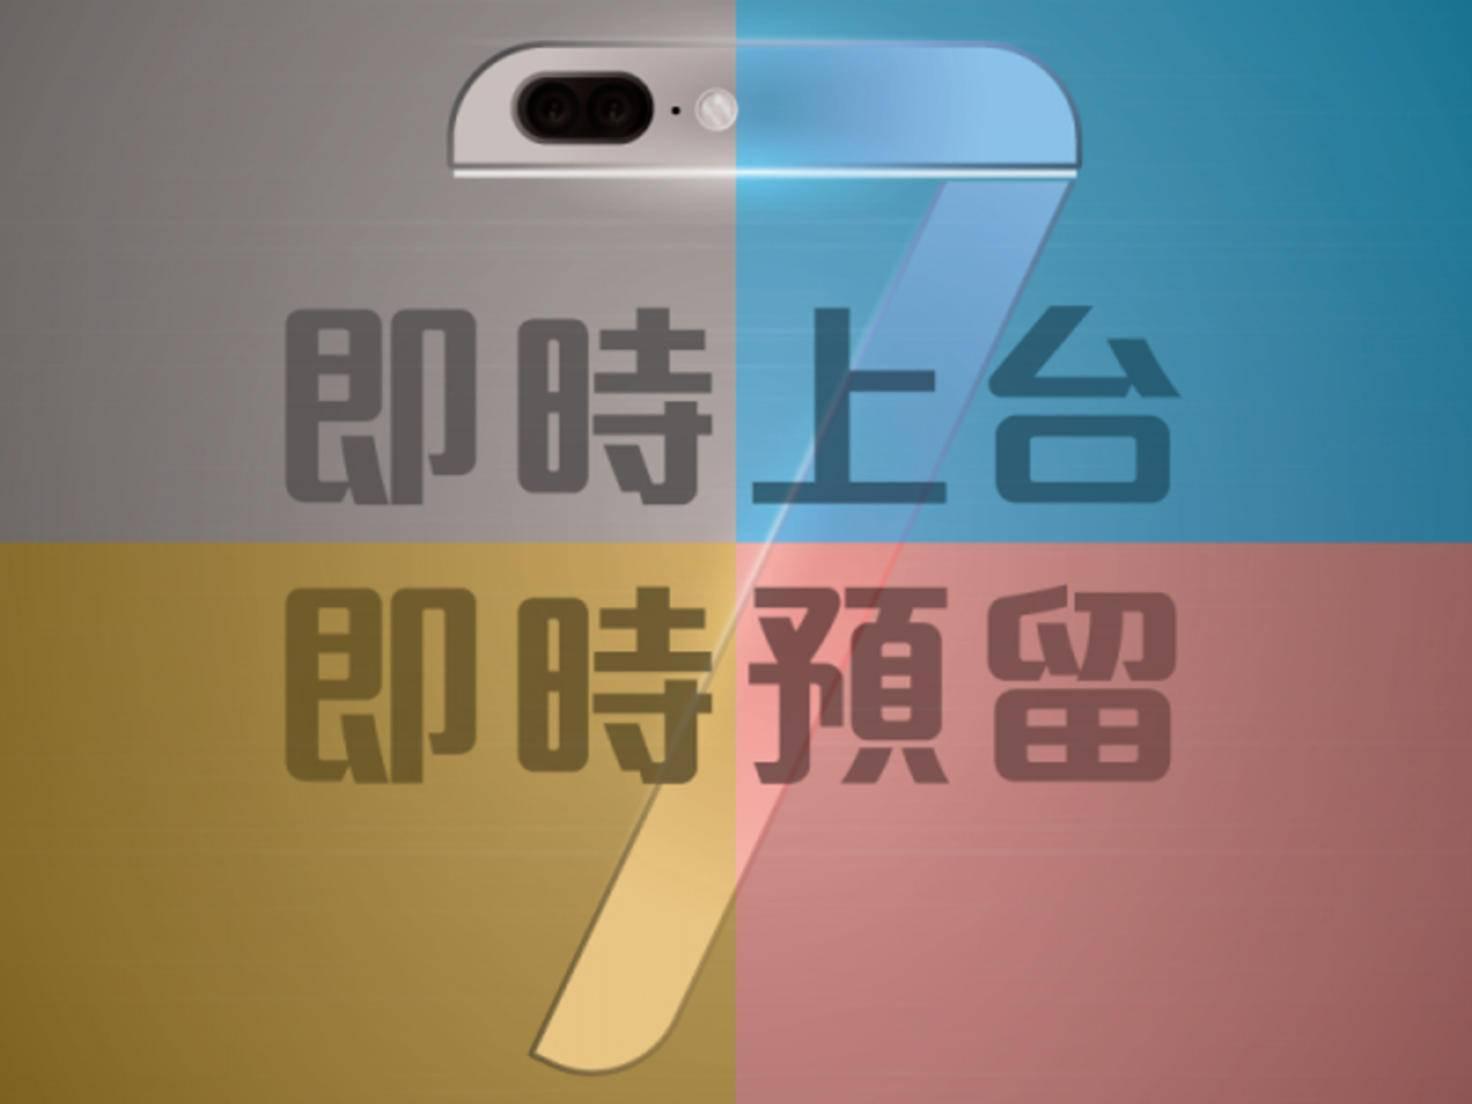 China Unicorn iPhone 7